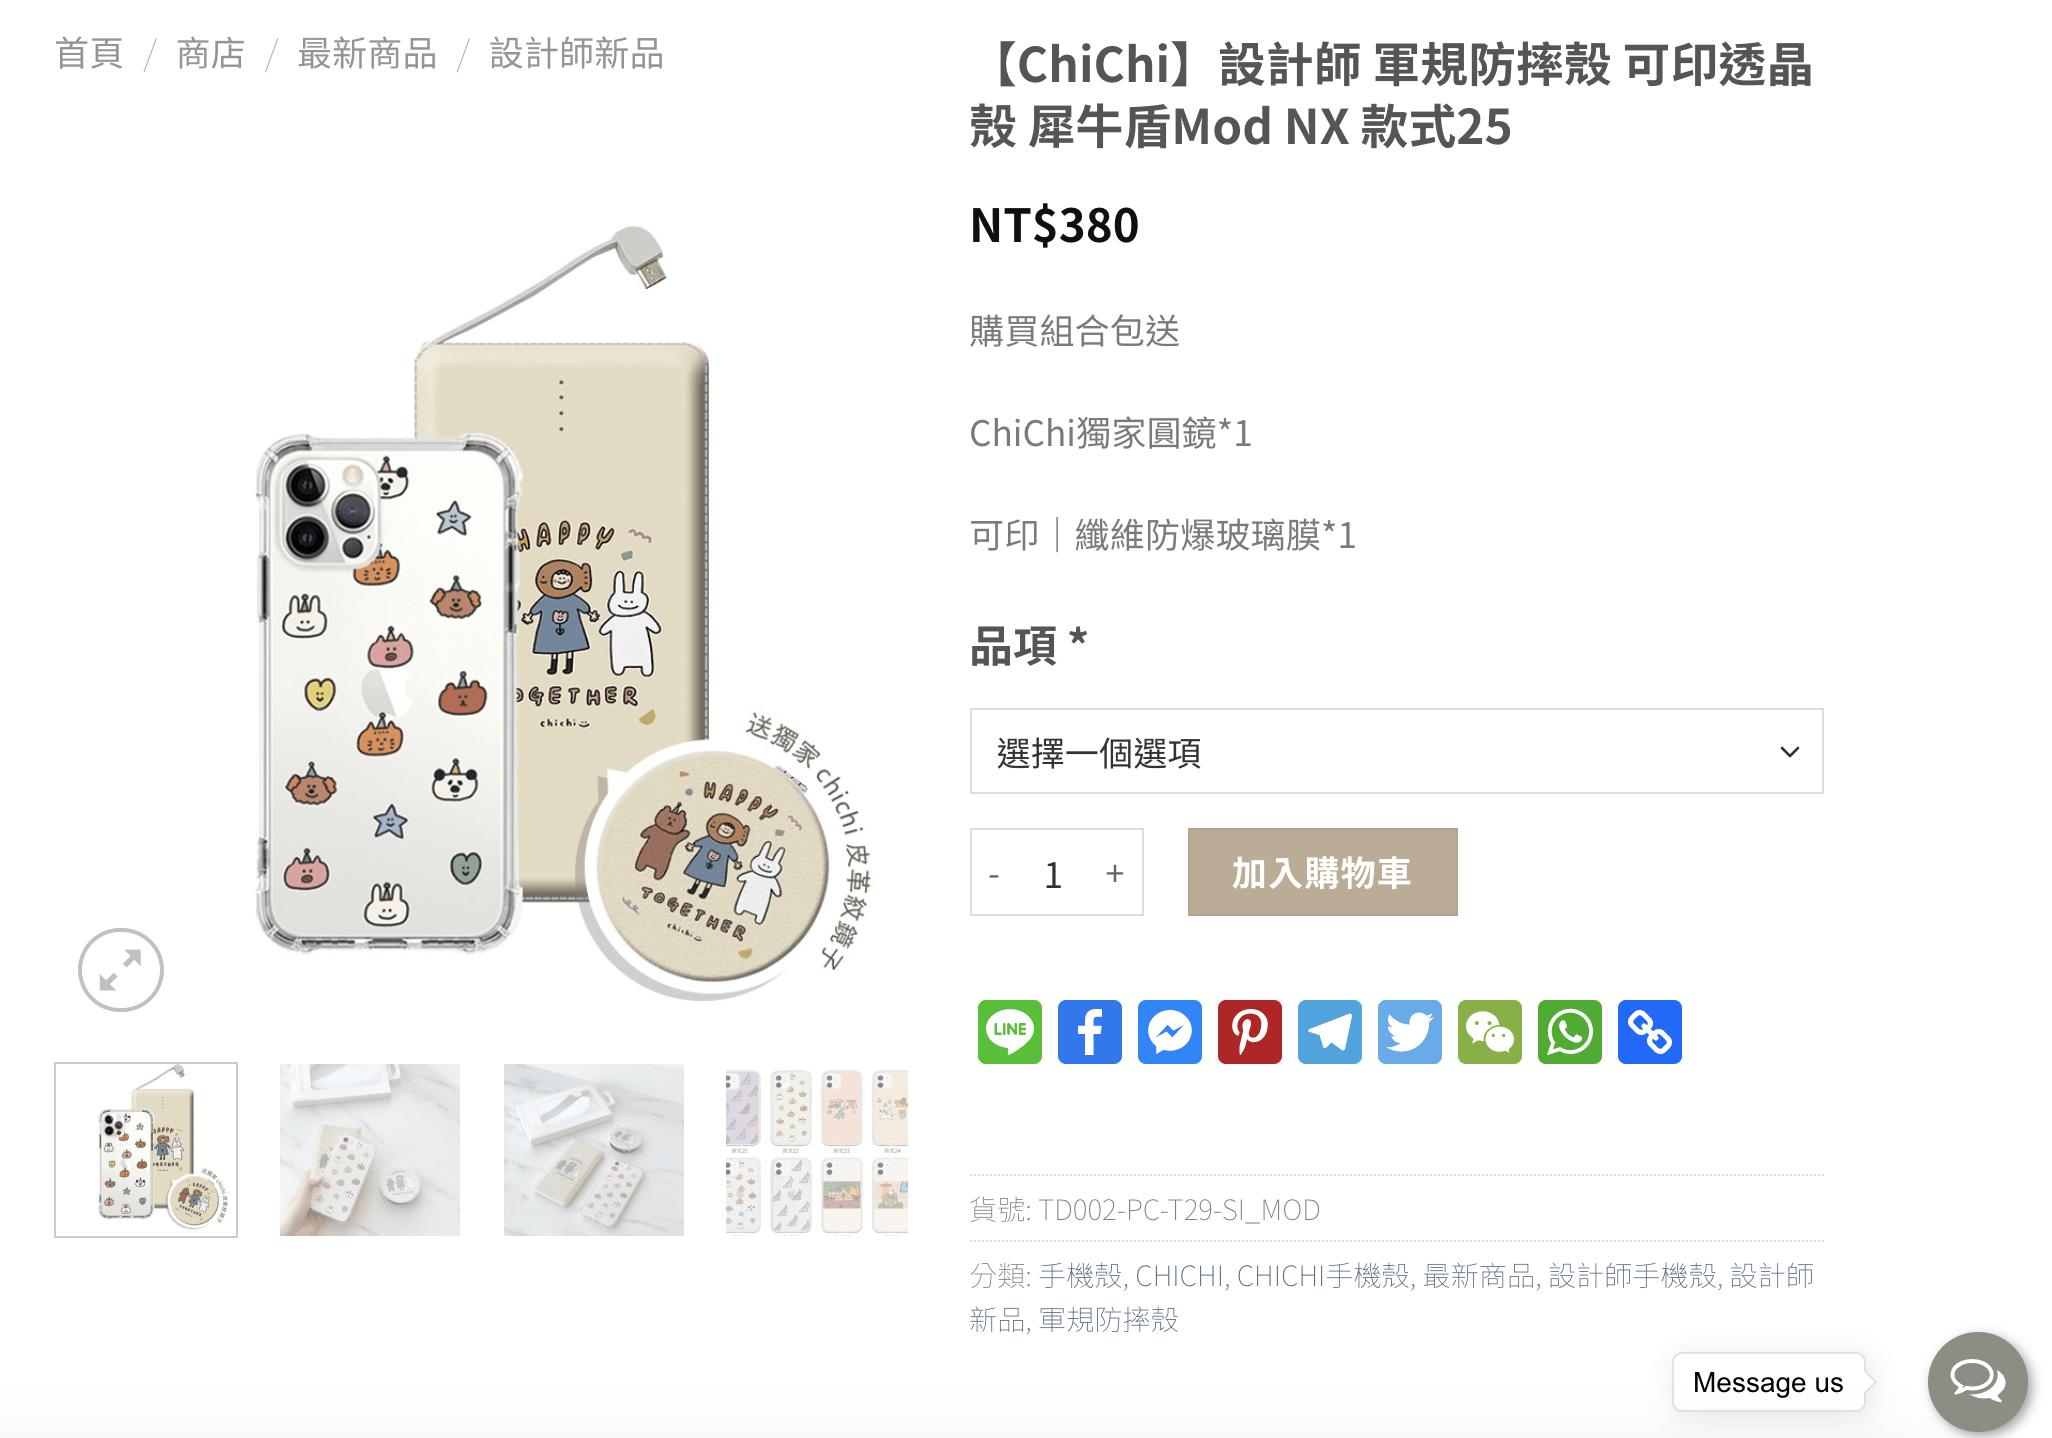 【ChiChi】設計師 軍規防摔殼 可印透晶殼 犀牛盾Mod NX 款式25